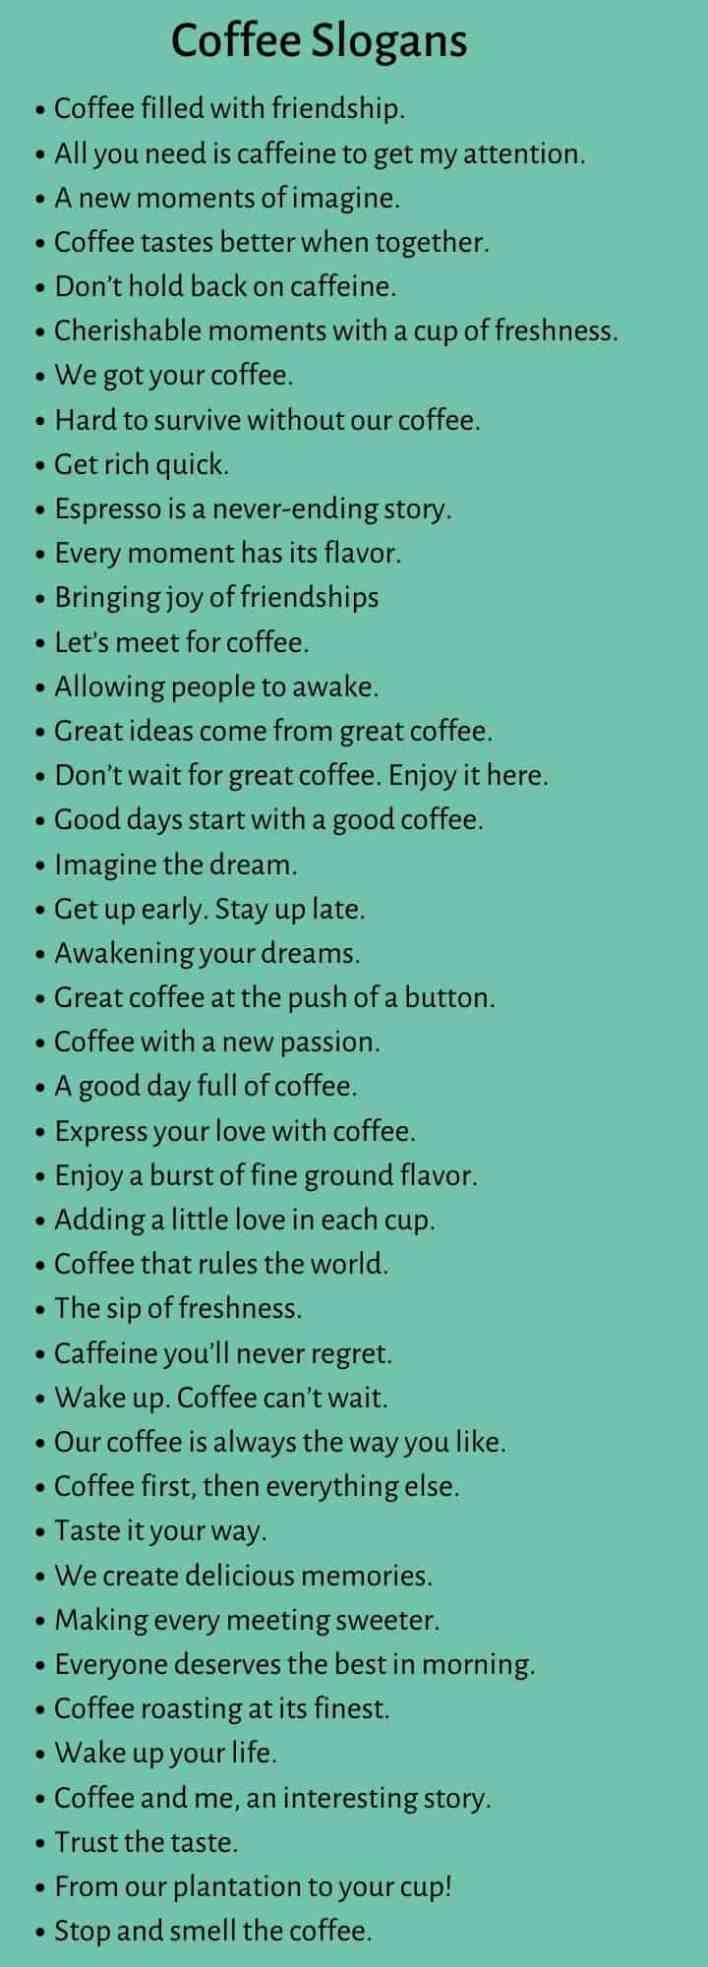 Coffee Slogans